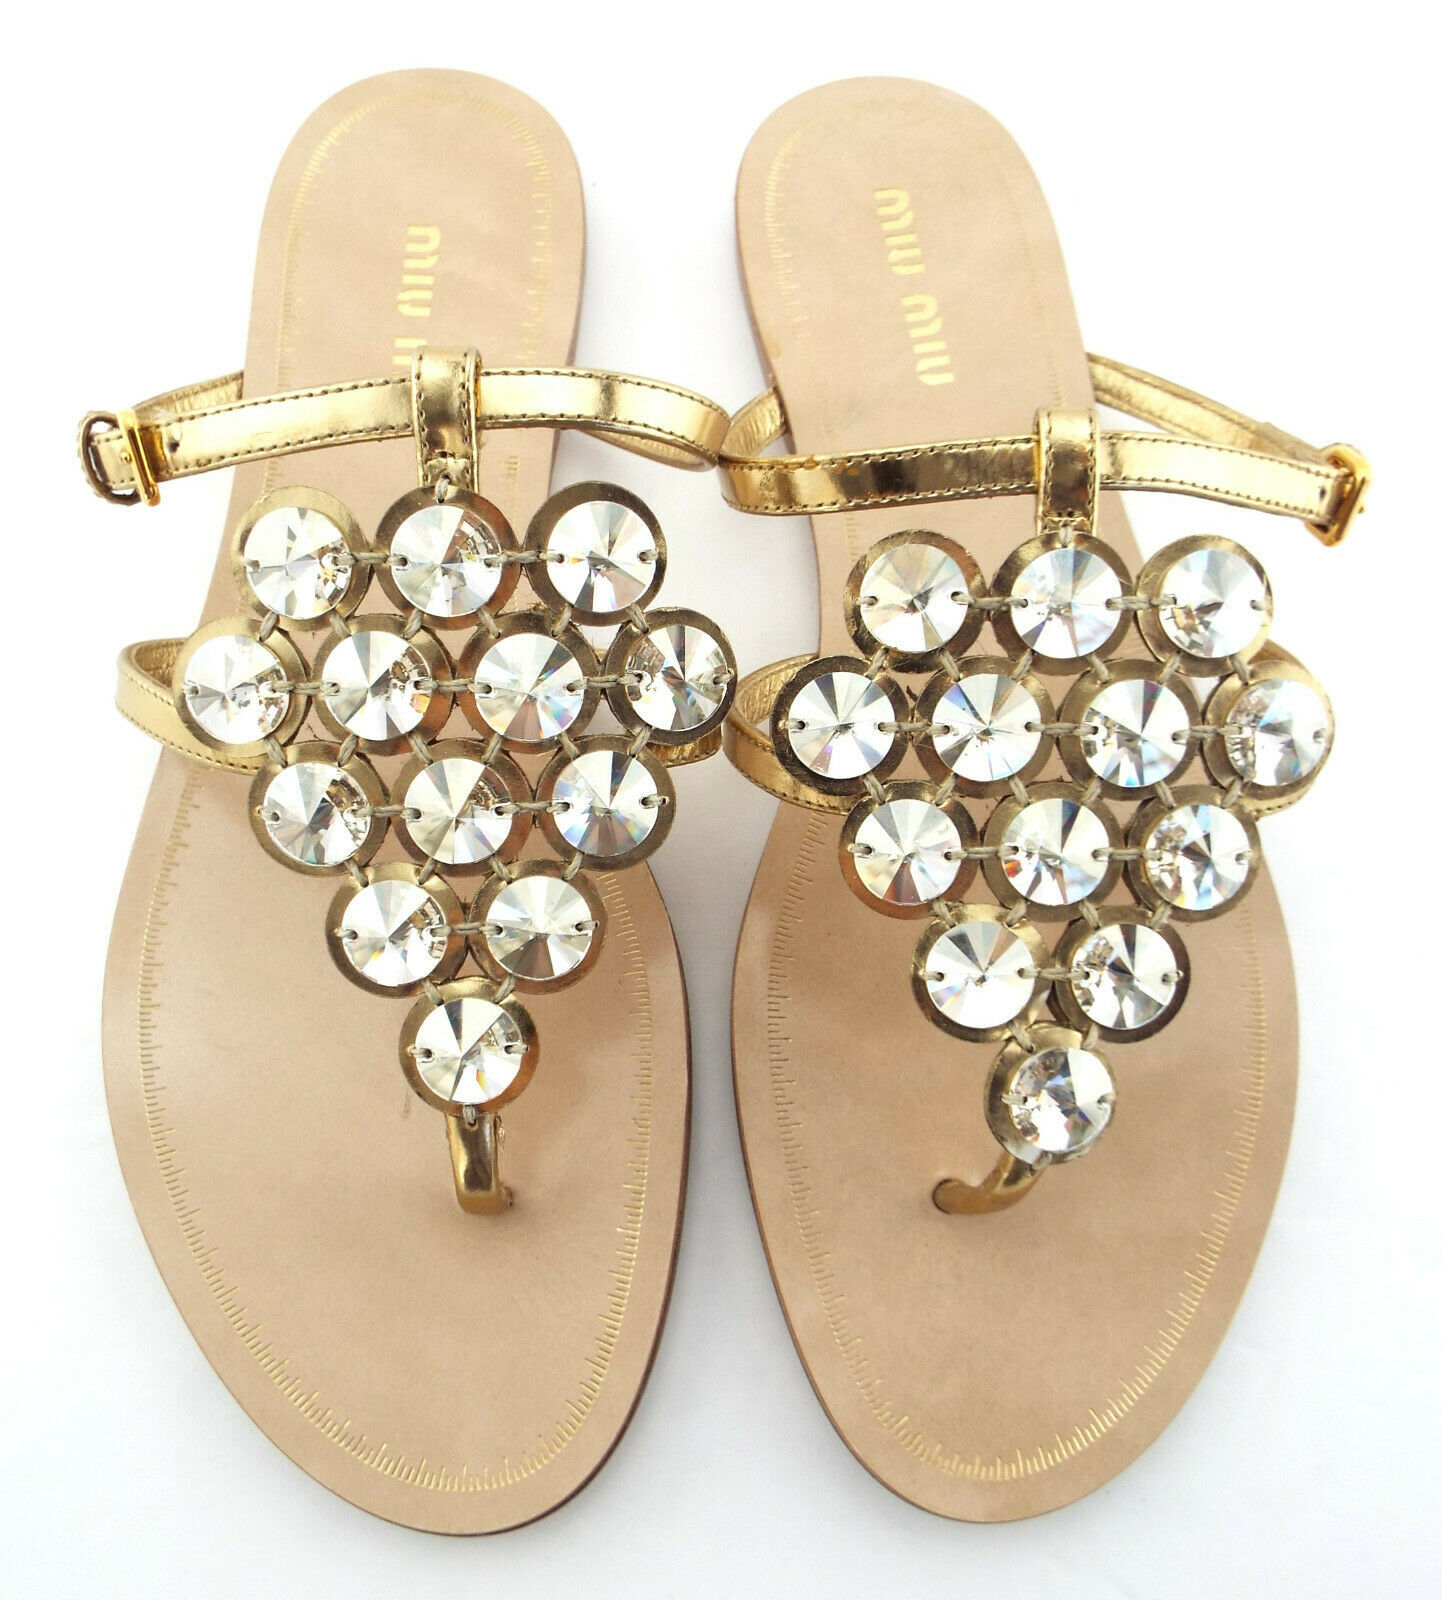 New MIU MIU Size 6.5 Gold Crystal Mantle Thong Slide Sandals Shoes 36 1/2 Prada